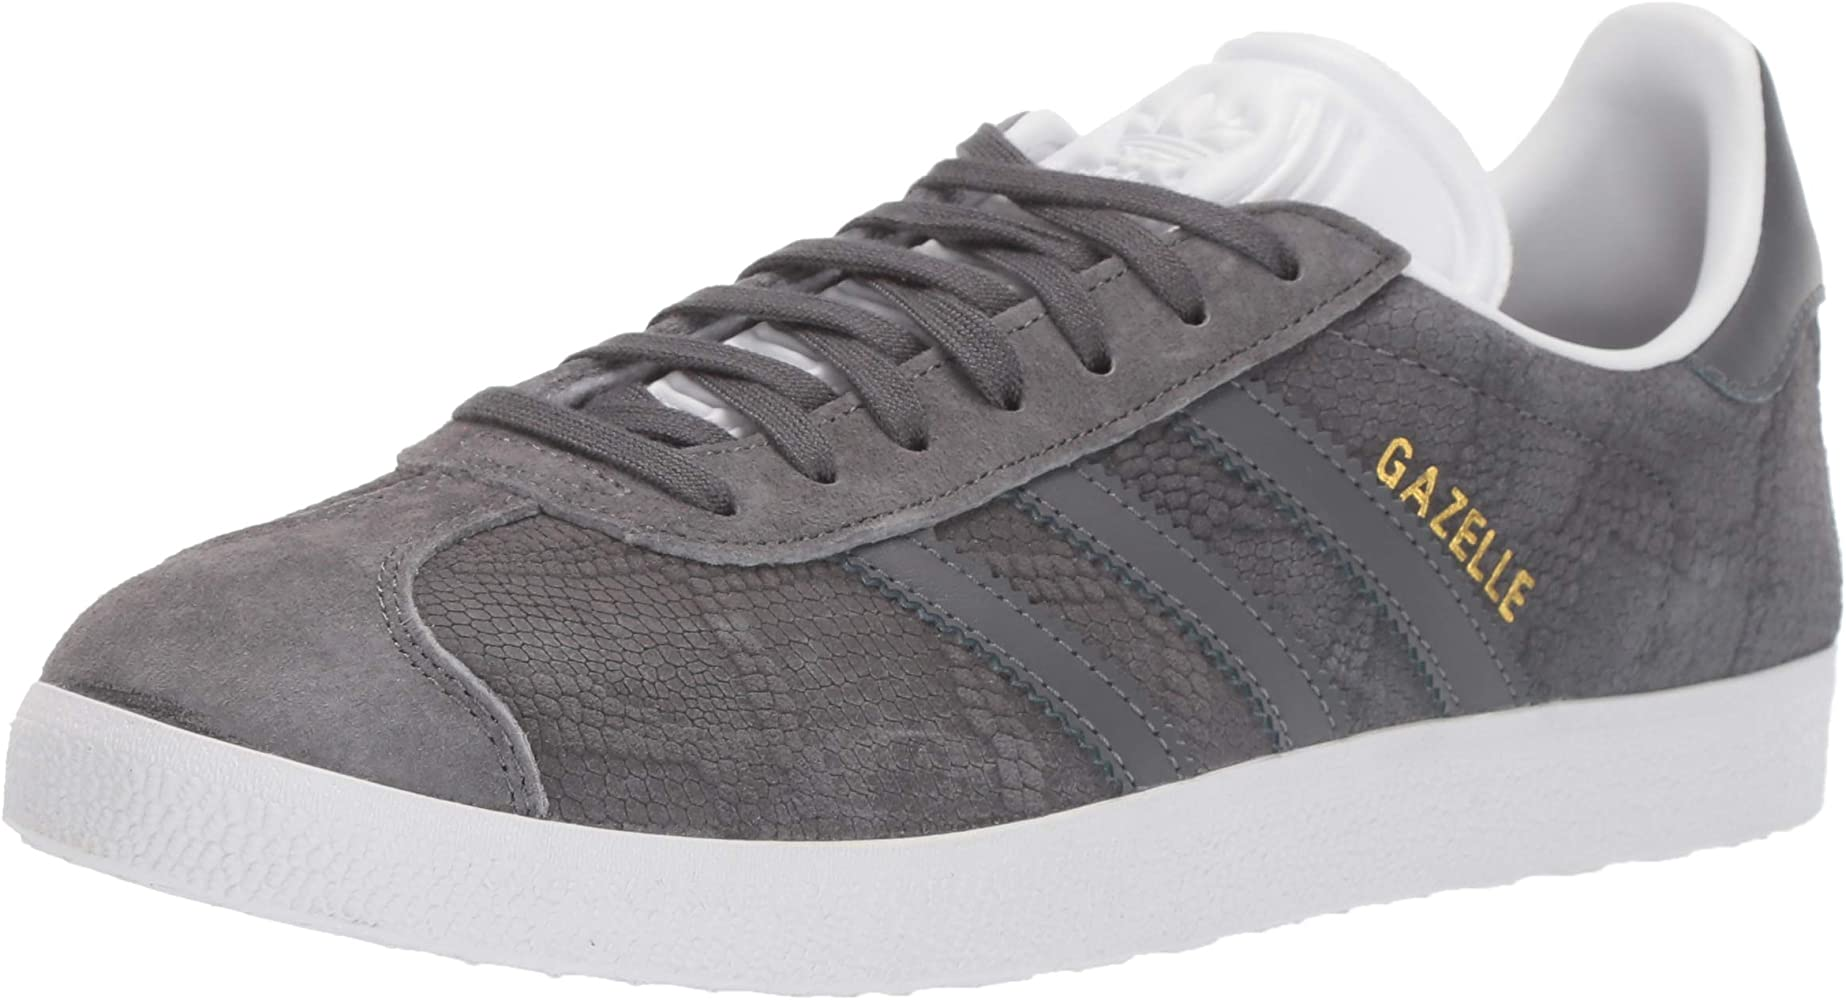 Adidas ORIGINALS Gazelle, Medium, Grigio (GrigioGrigio